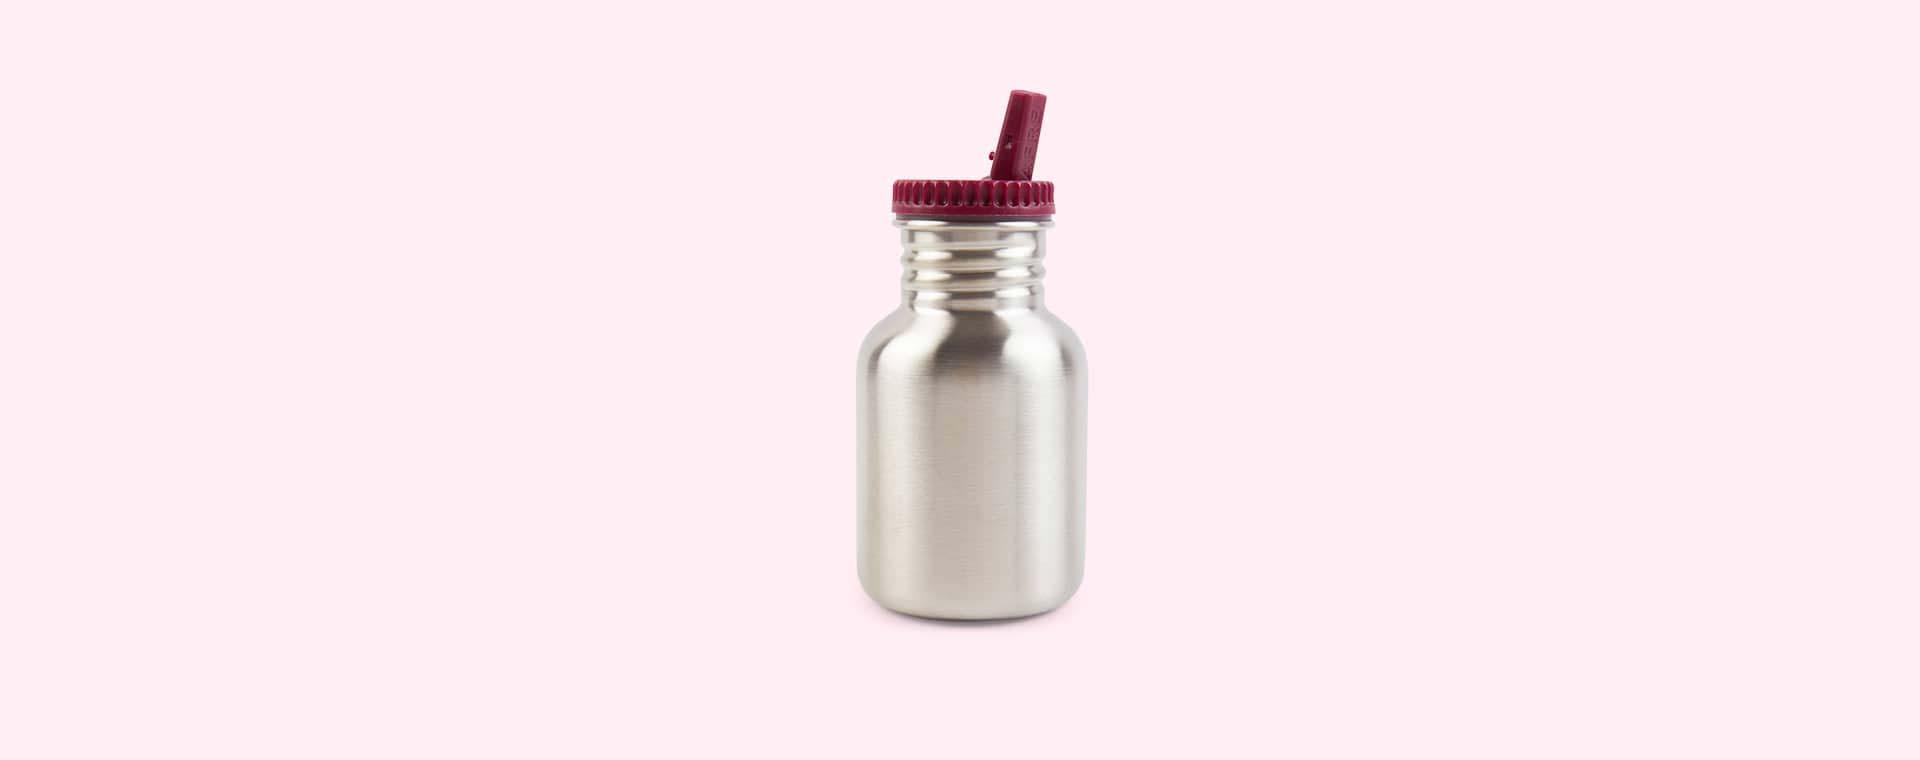 Plum Blafre Non Spill Drinking Spout